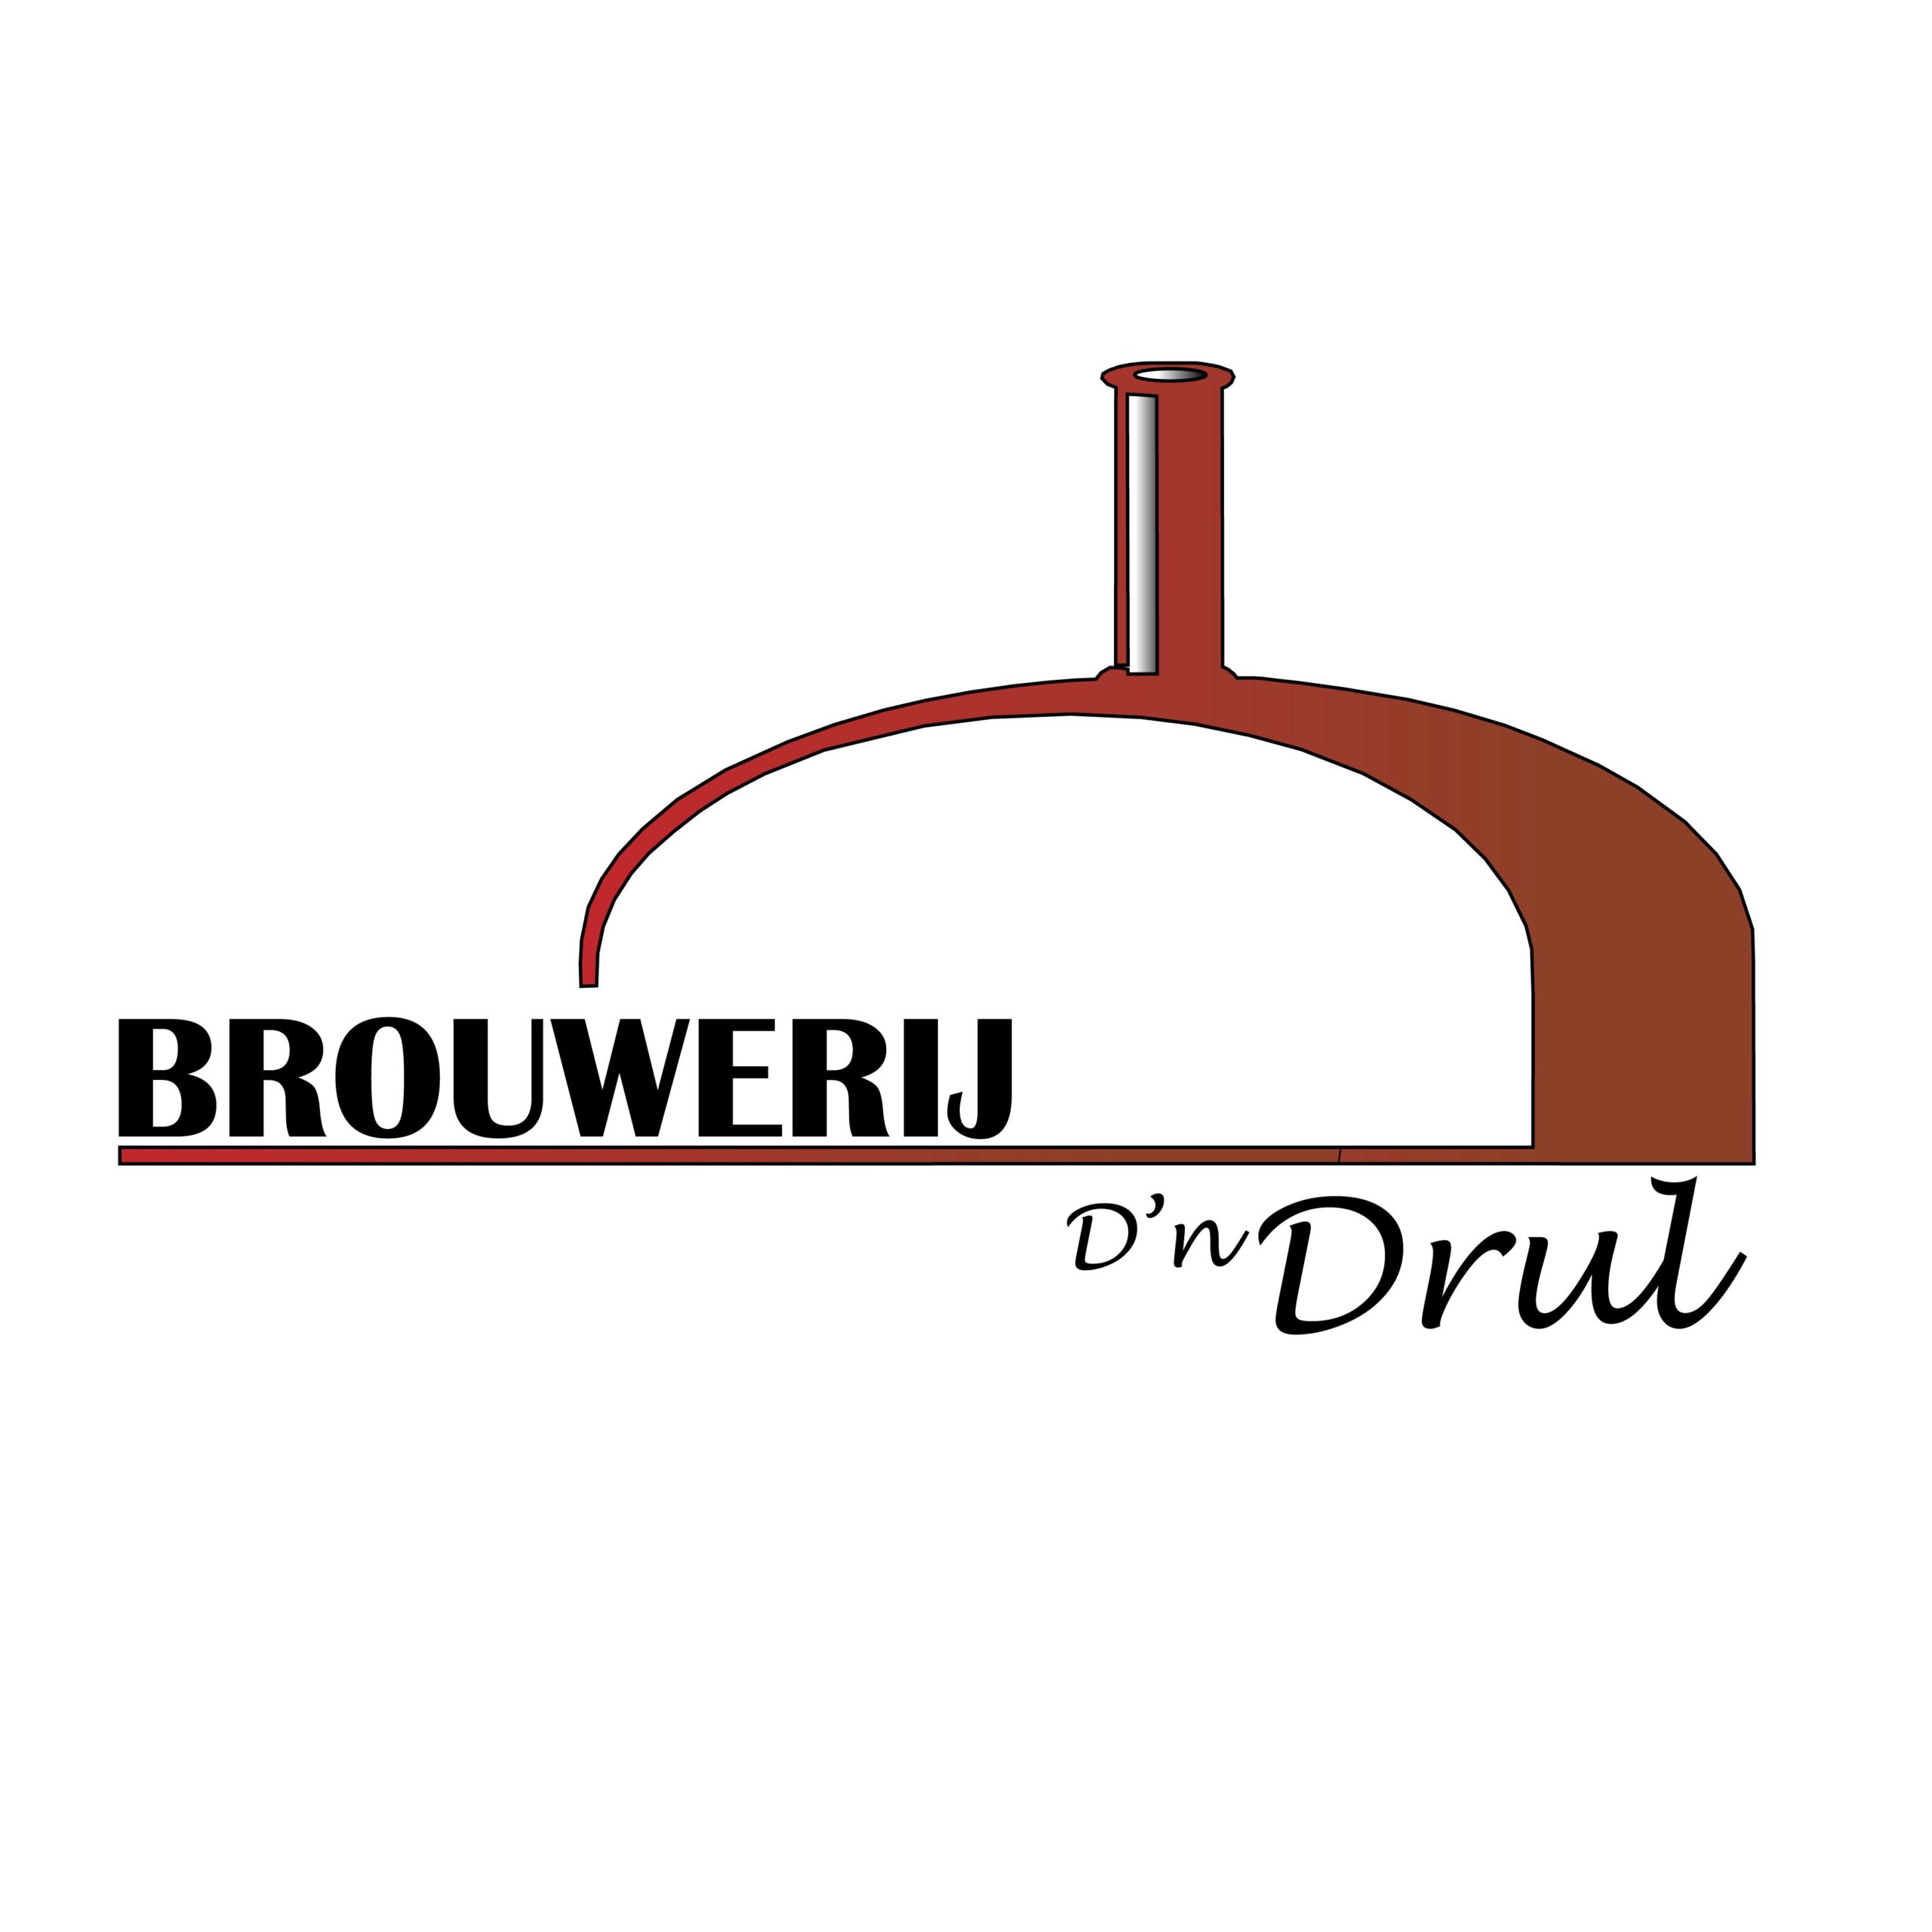 2019 09 11 Logo d'n Drul Origineel VIERKANT v1.0-01 (003)